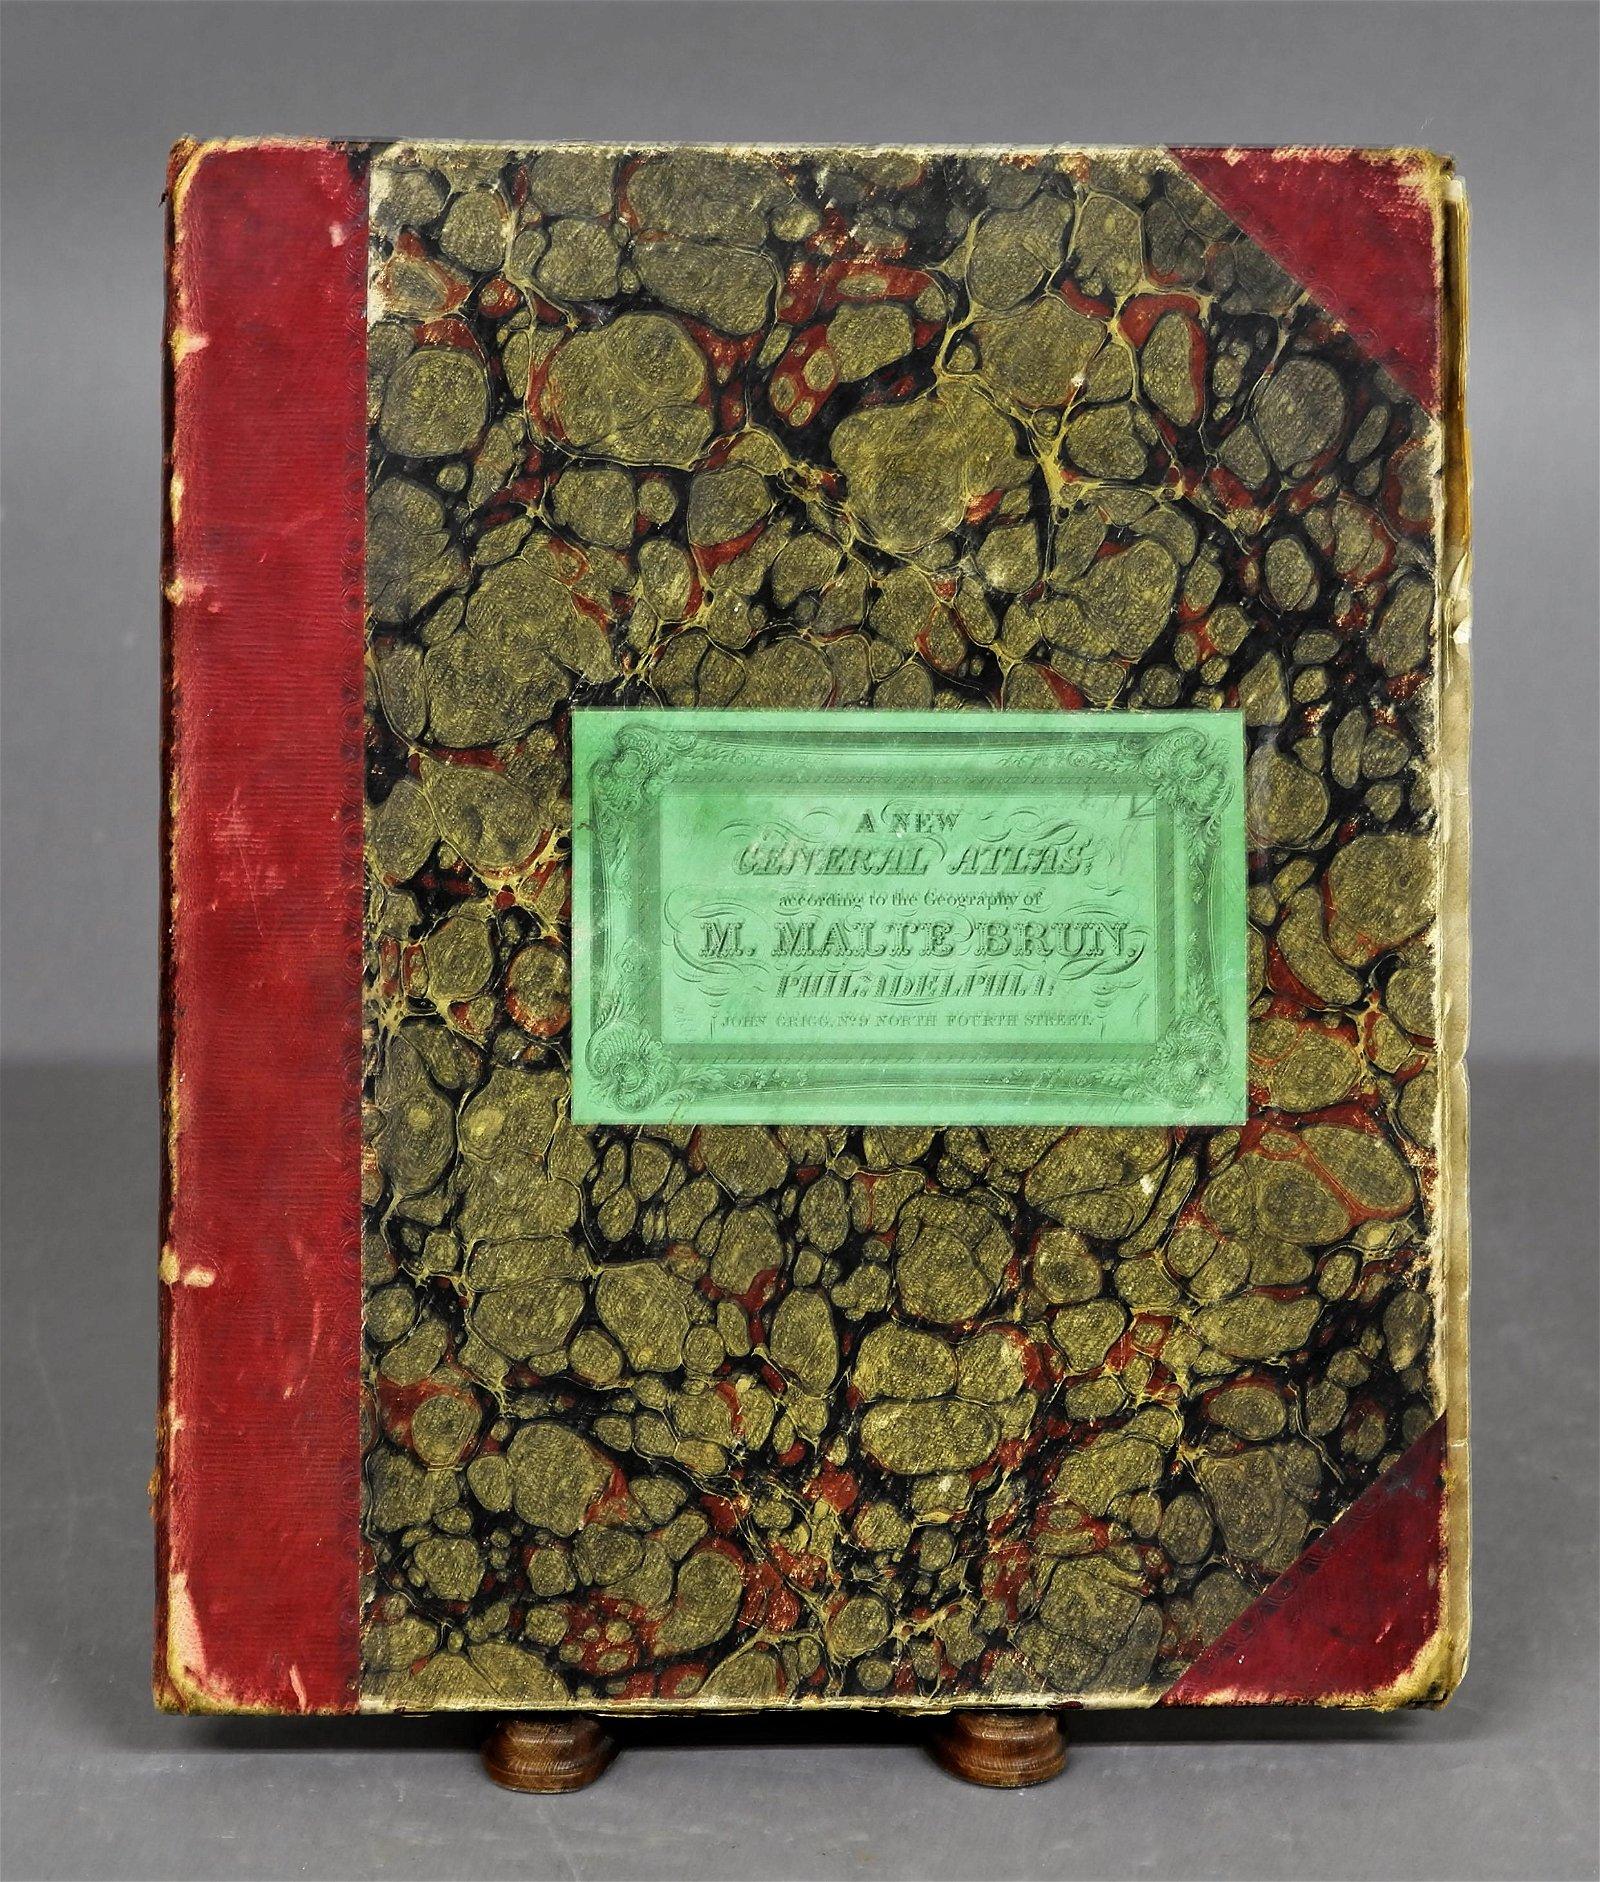 M. Malte-Brun Mapbook